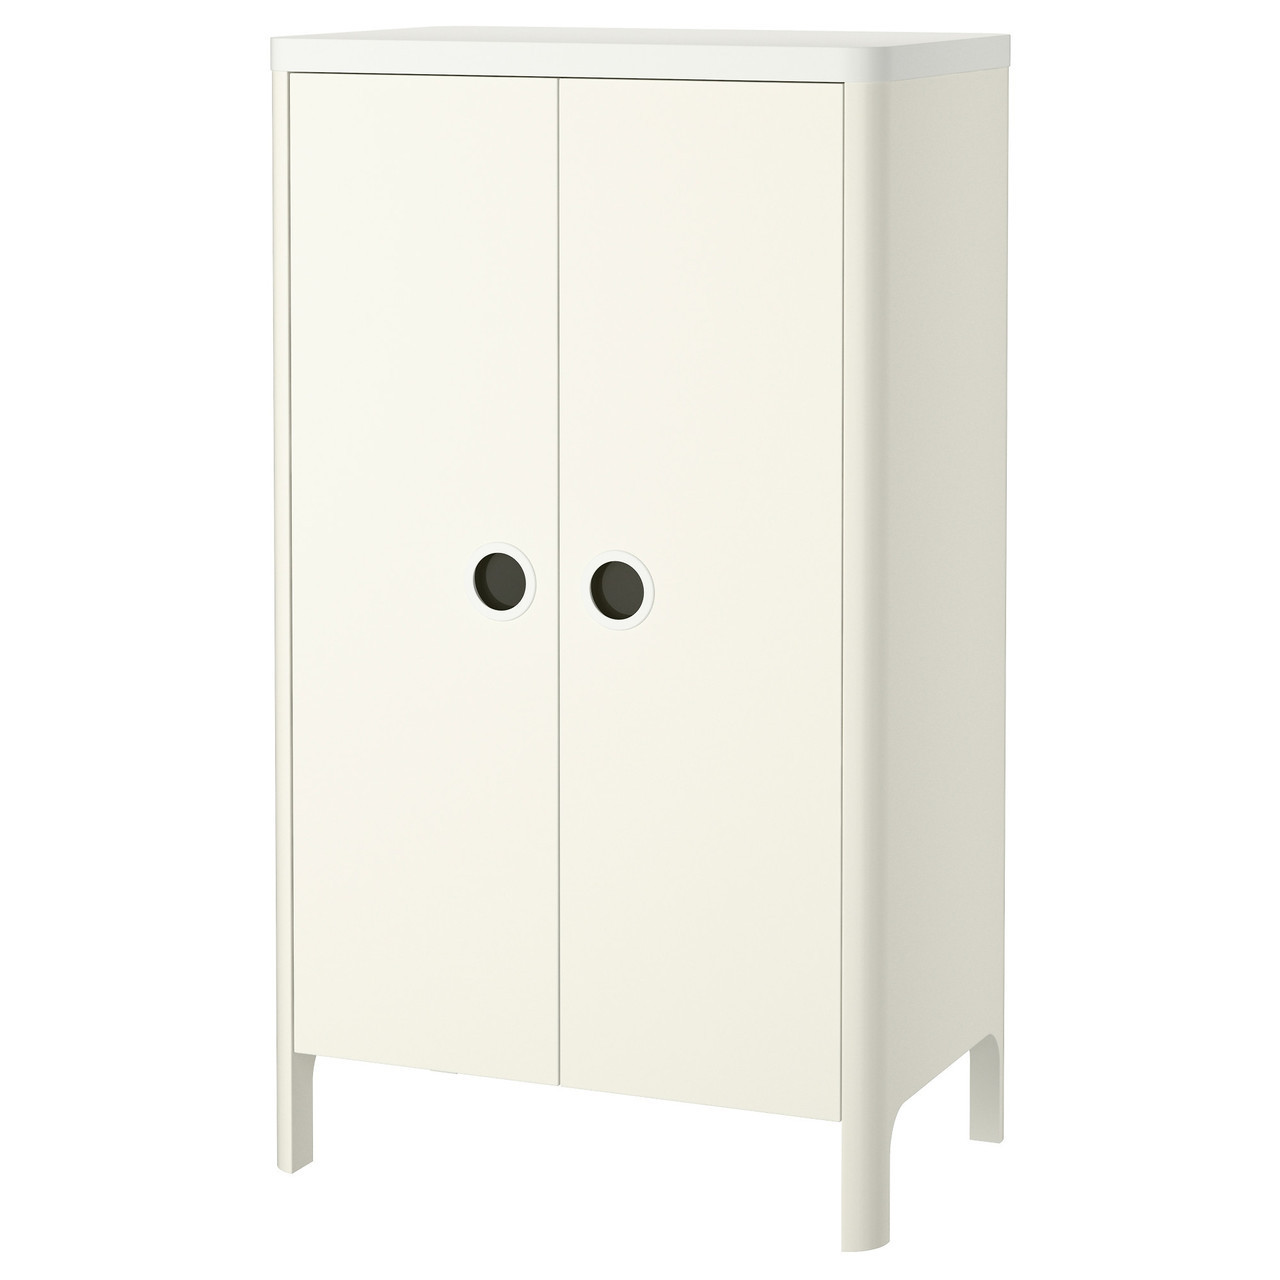 BUSUNGE Шкаф, белый 203.057.07